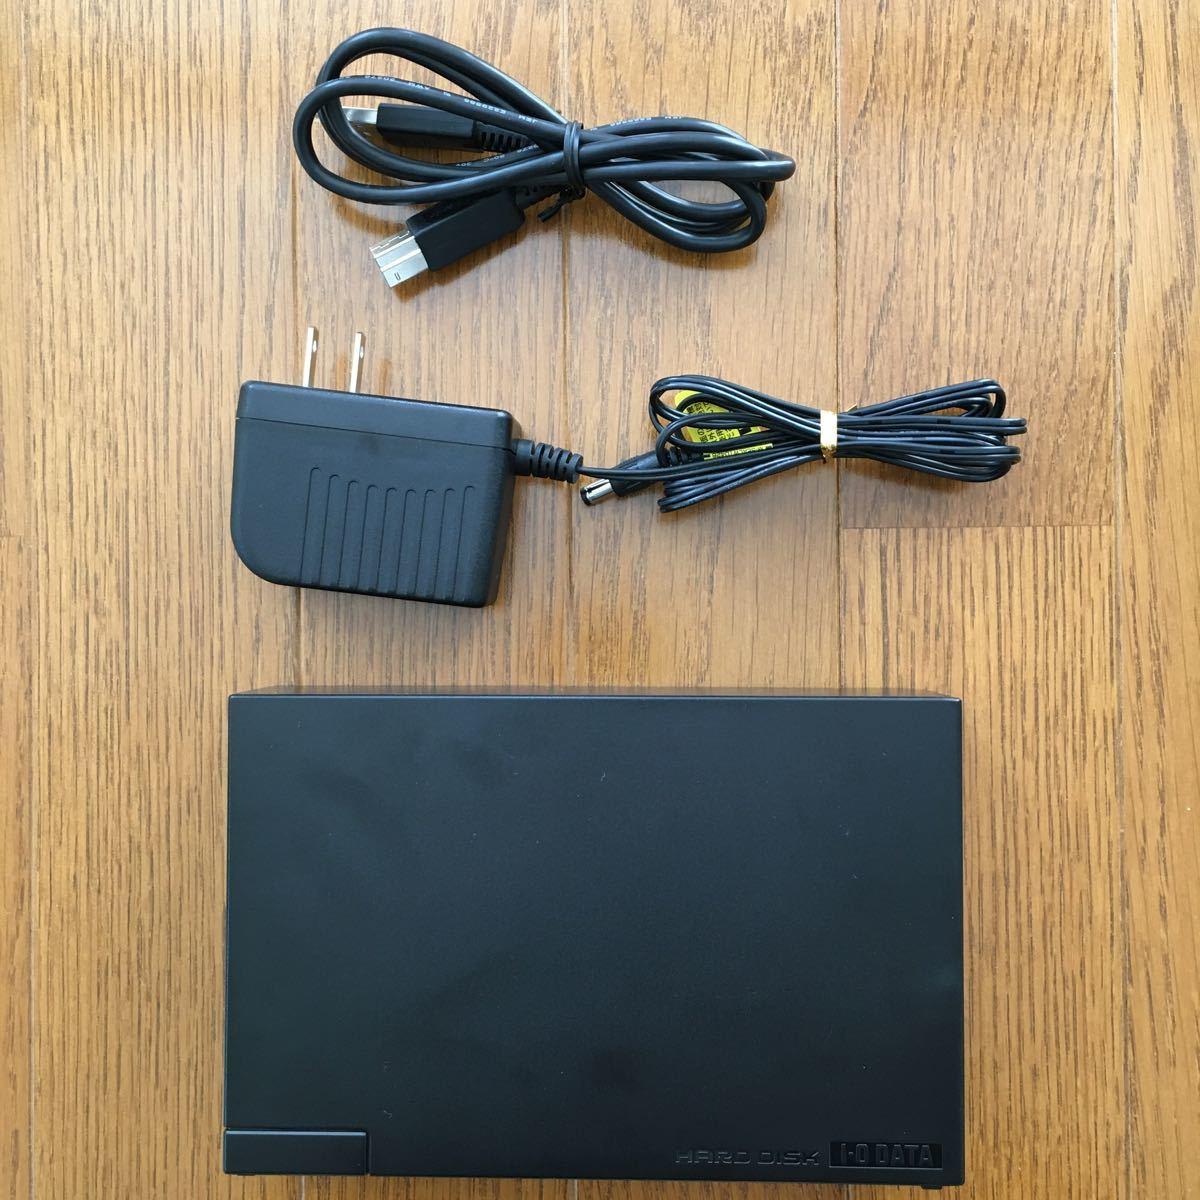 I・O DATA 外付けハードディスク HDCL-UTE 3.0TB